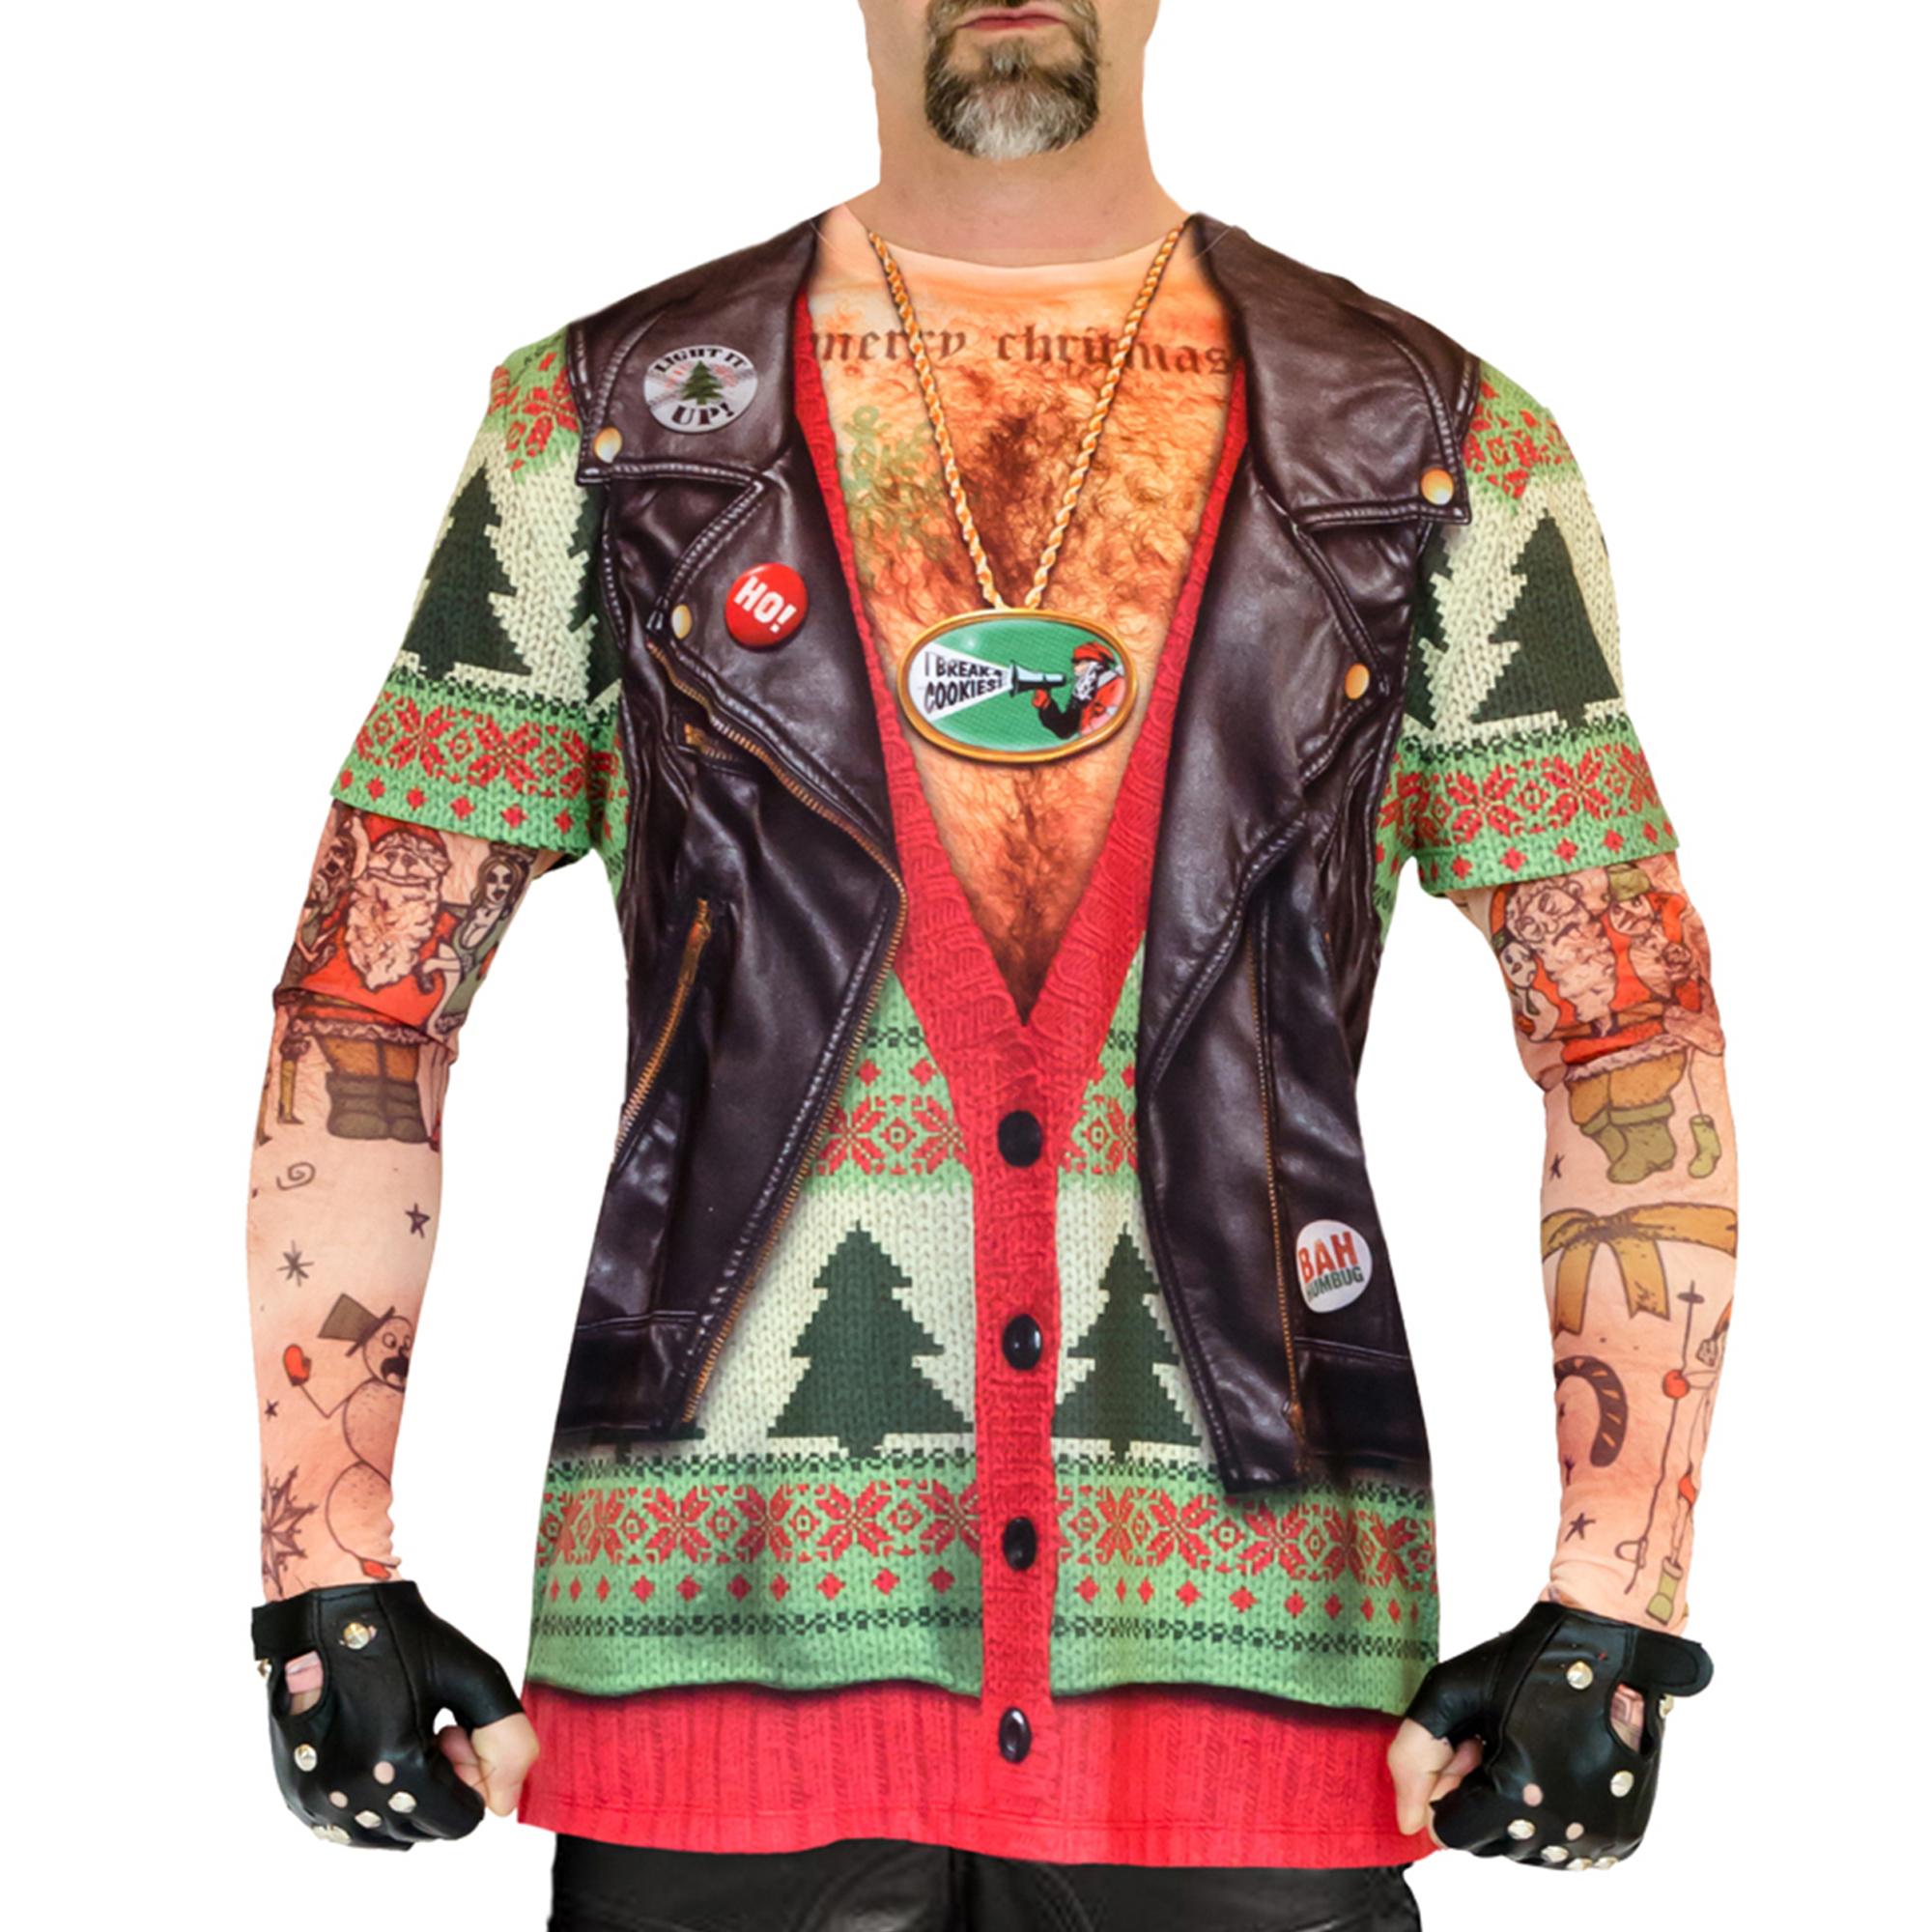 Xmas Biker Sweater with Tattoo Mesh Men's Long Sleeve Tee Shirt